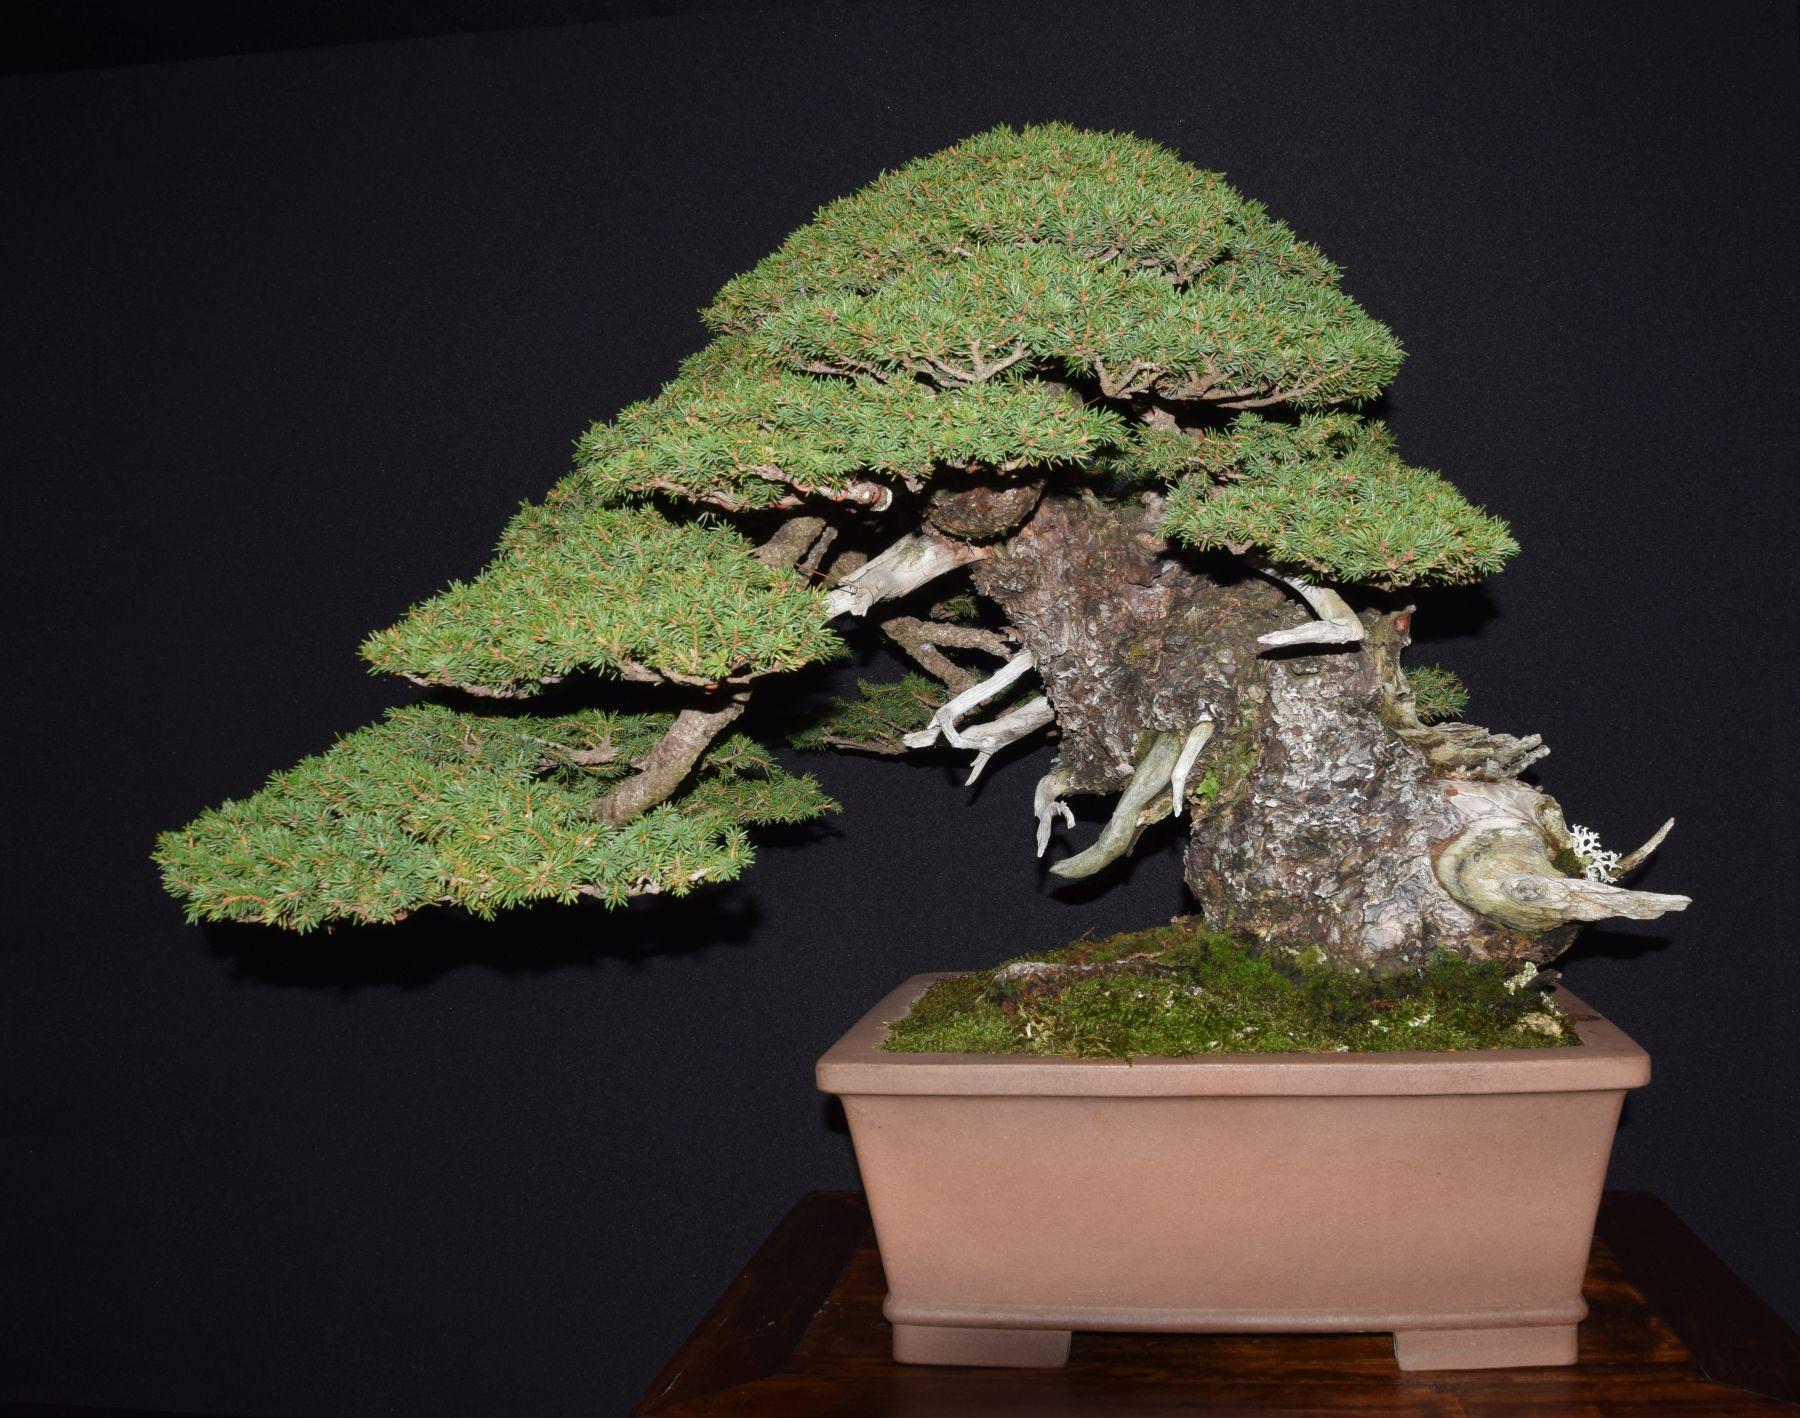 bonsai-museum-luis-vallejo-010